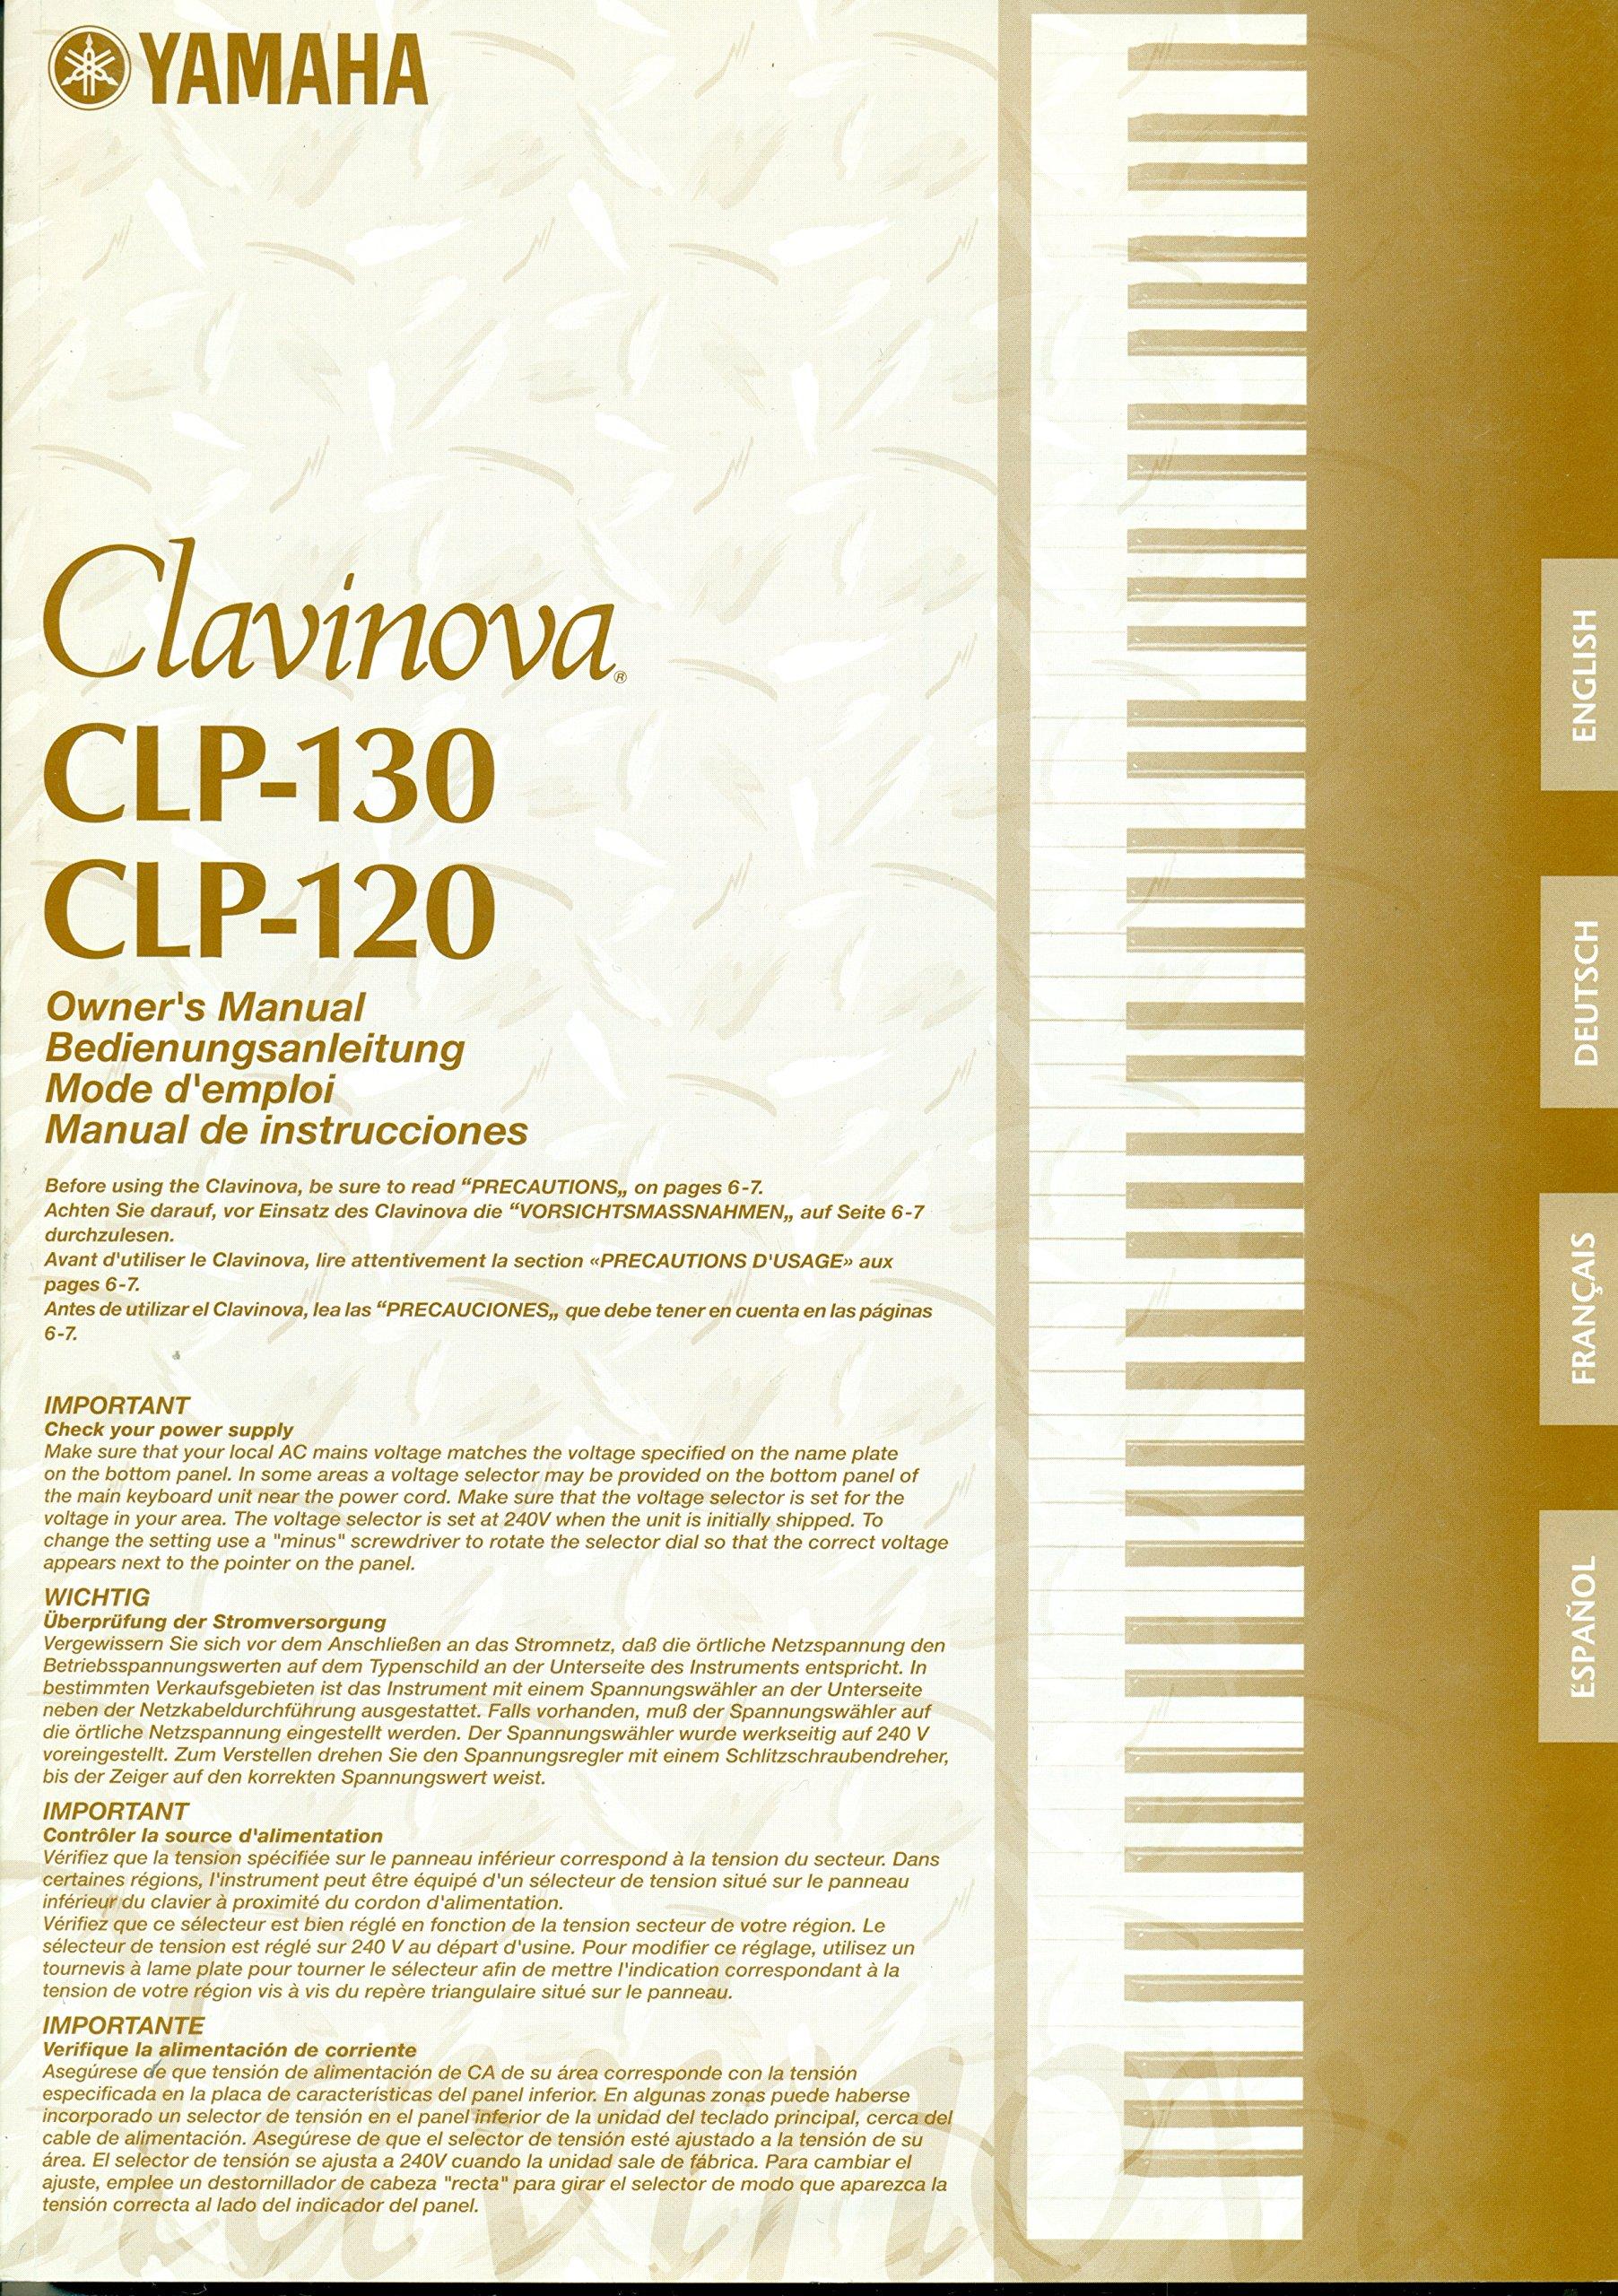 Yamaha Clavinova CLP-130, CLP-120 Manual: Yamaha Clavinova: 0799804608528:  Amazon.com: Books